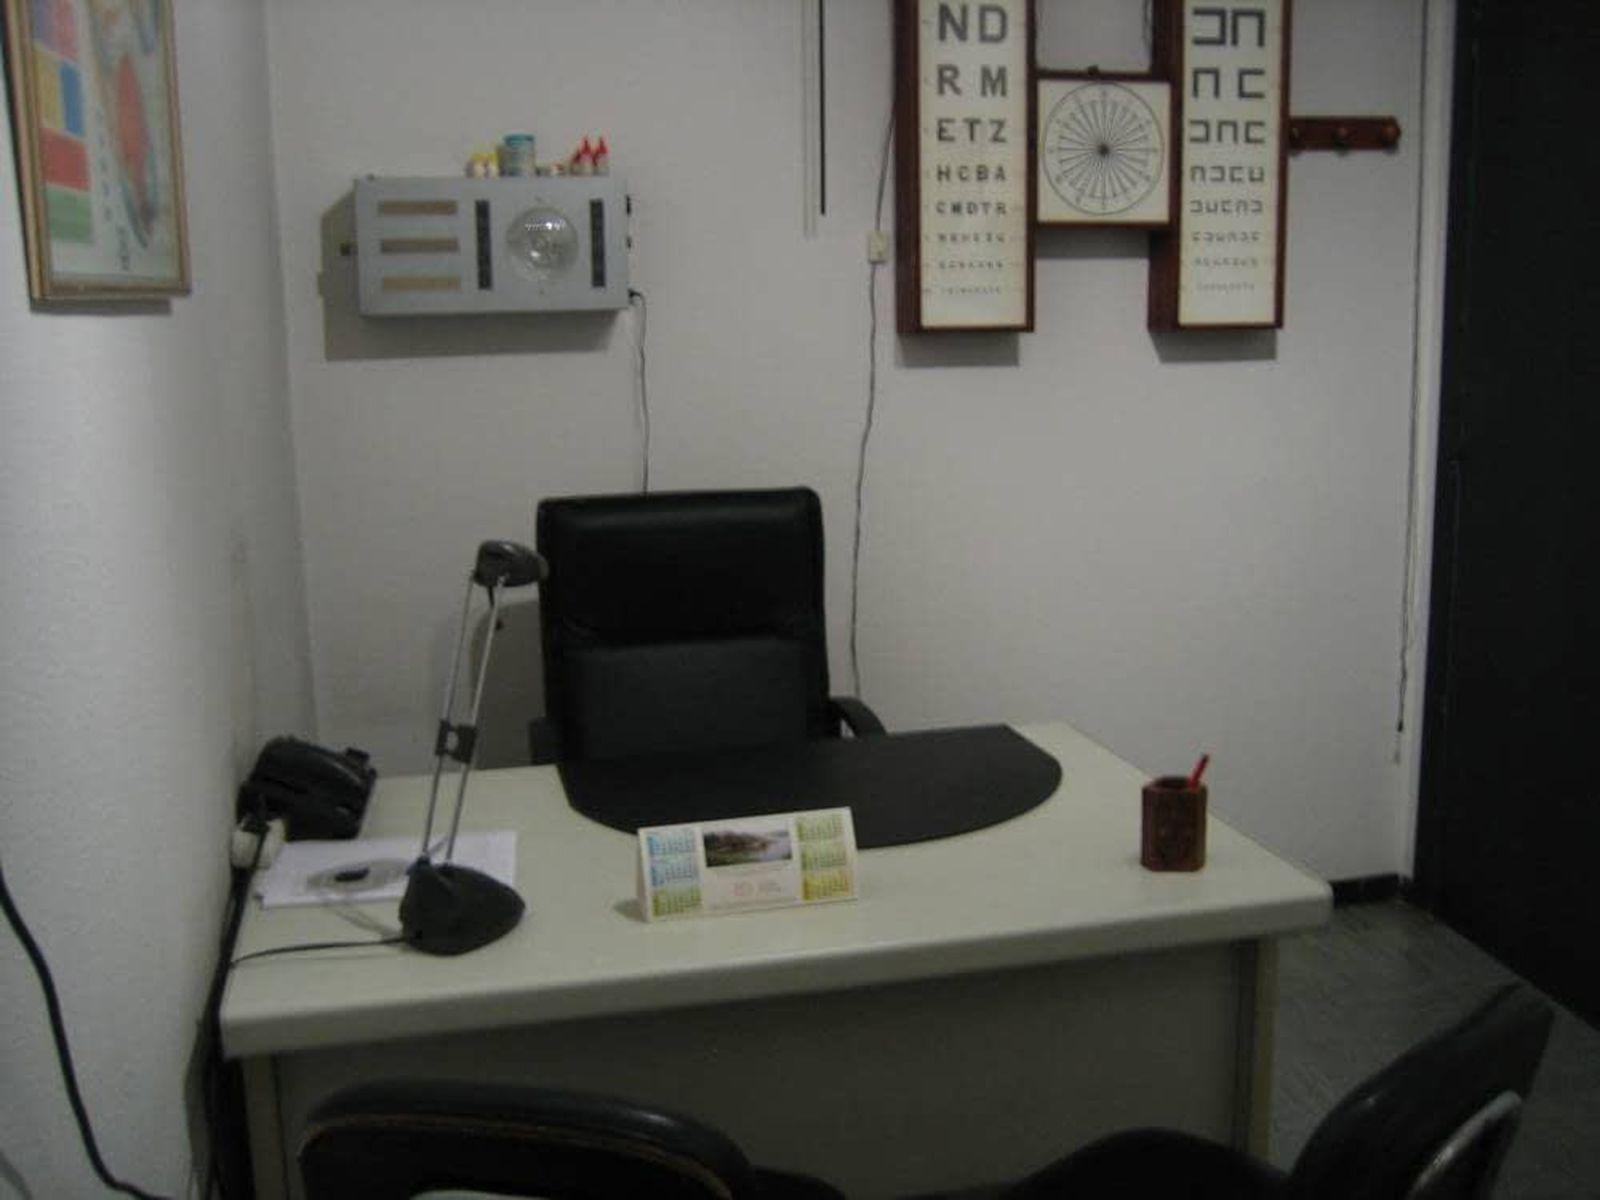 Renovación de carnet de conducir en Arganzuela Madrid